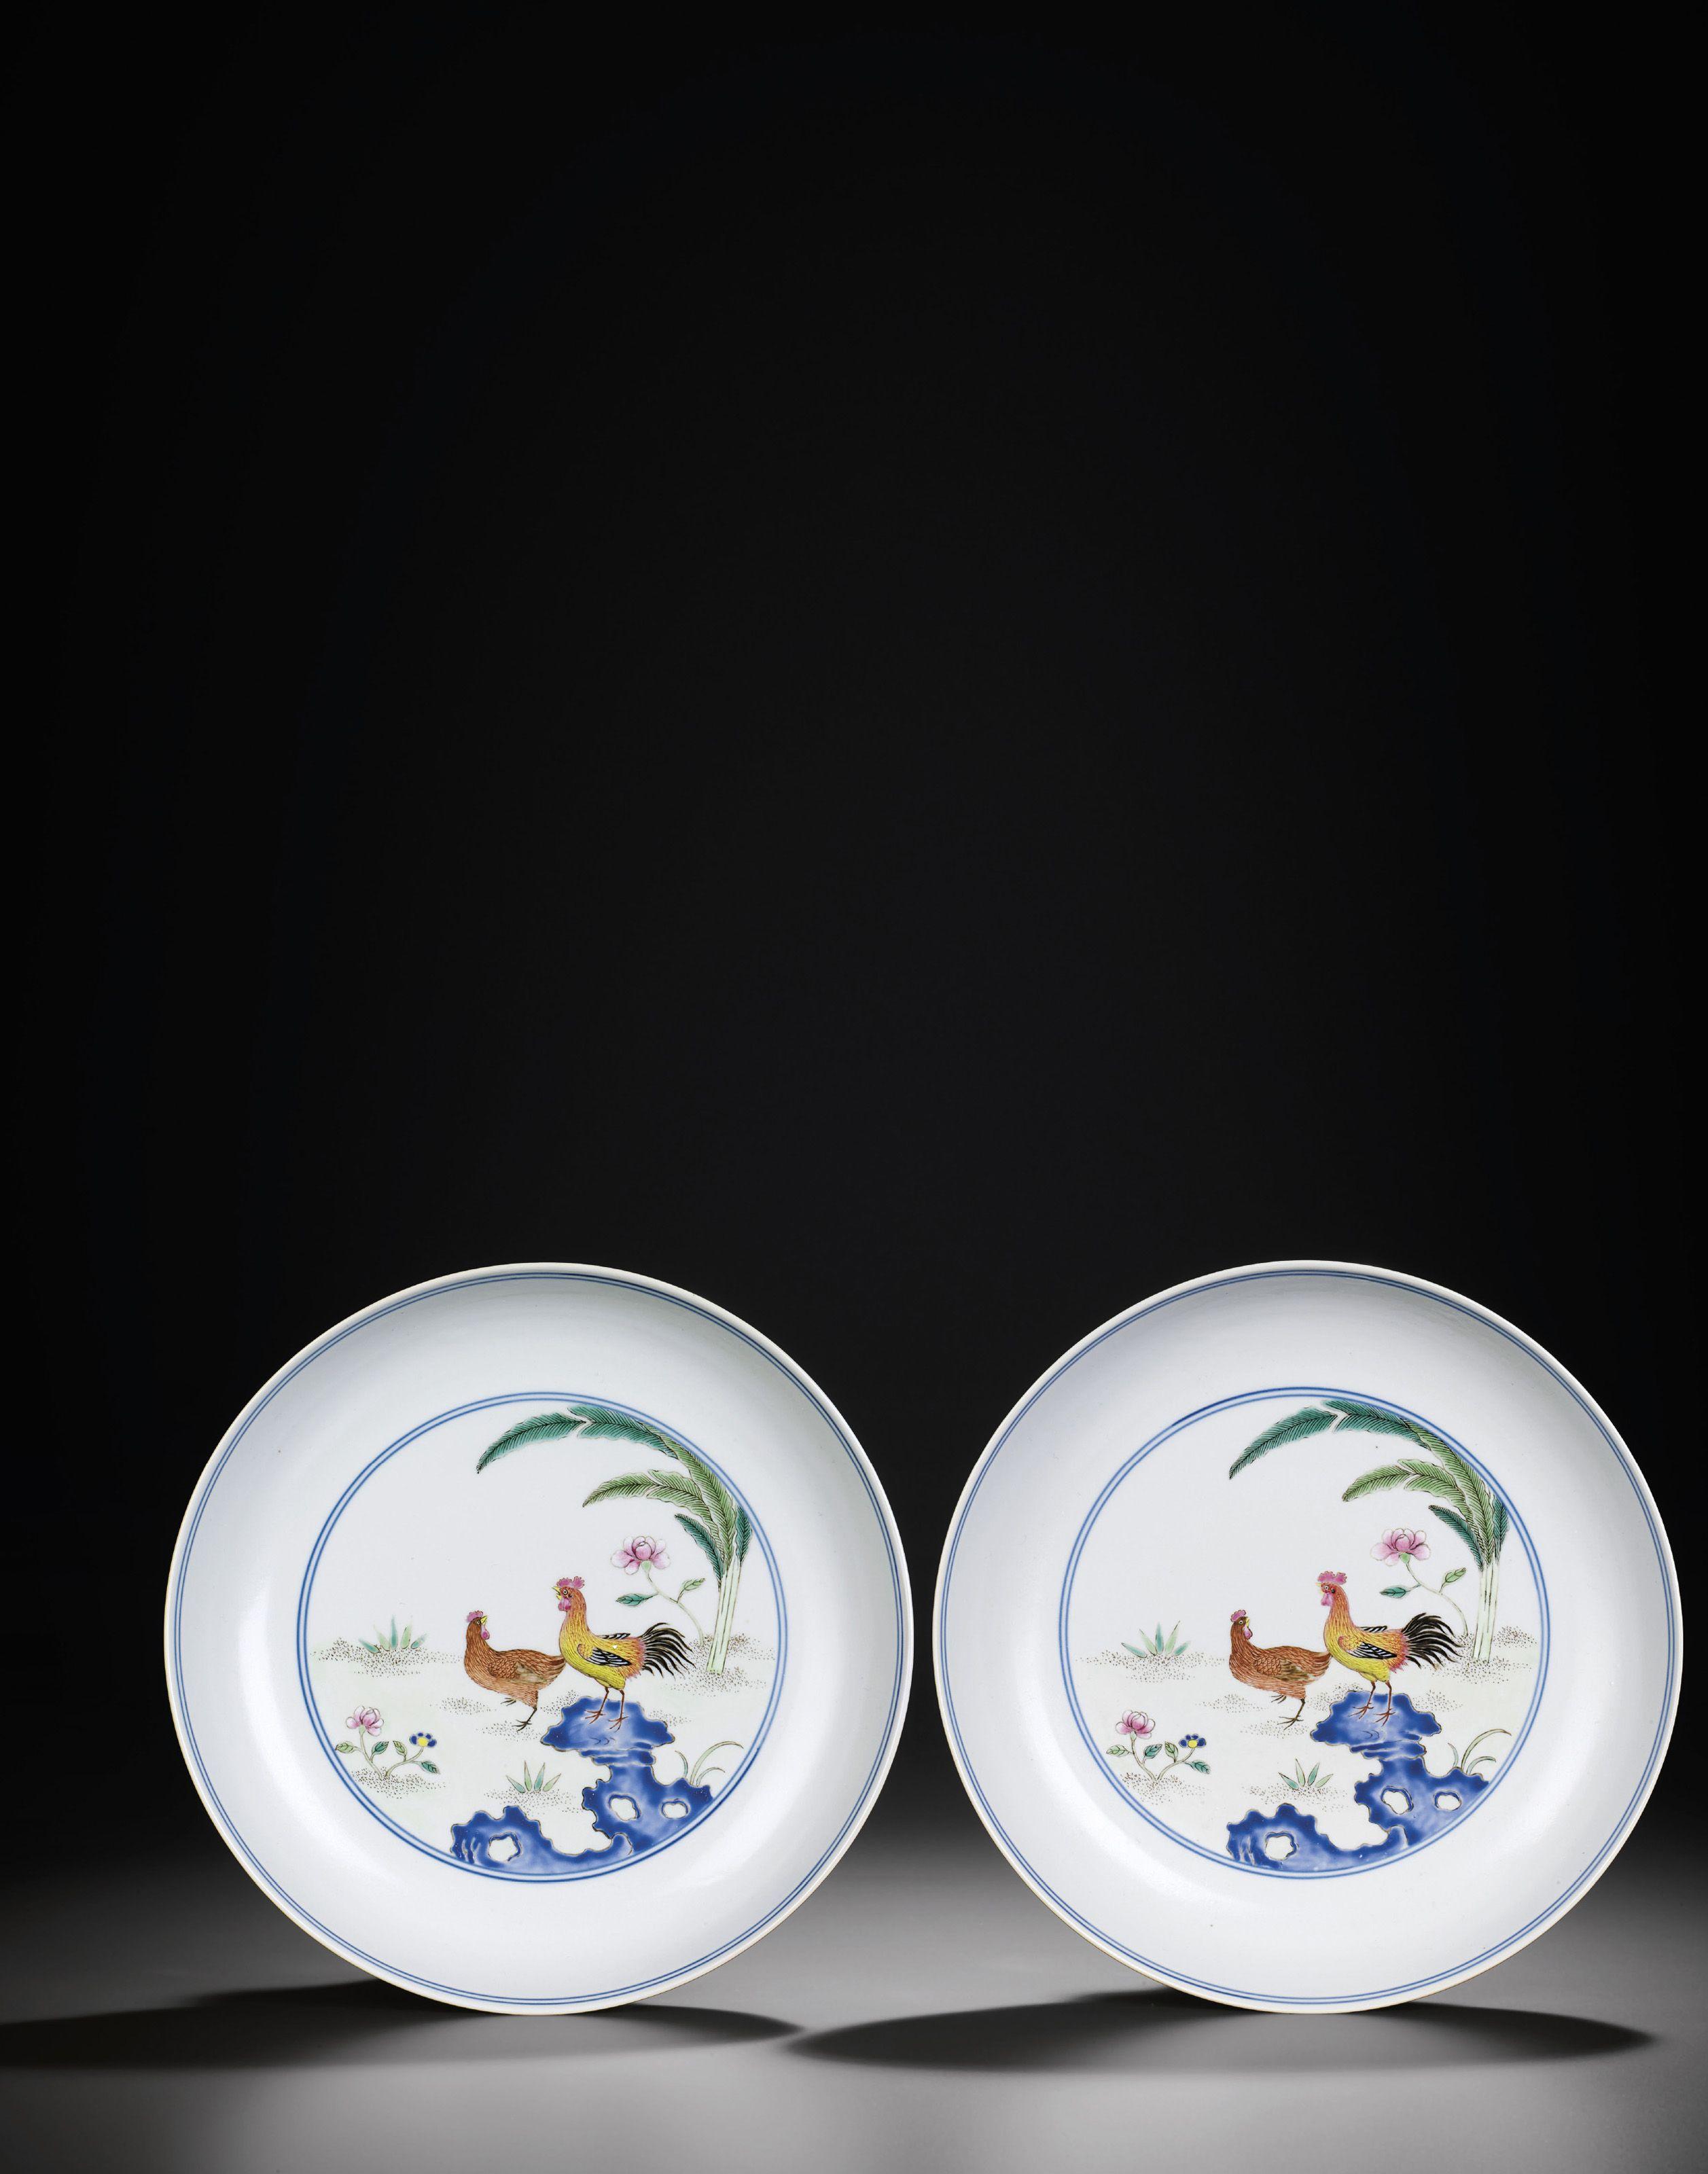 A Rare Pair Of Famille Rose Chicken Dishes Qianlong Jiaqing Period 1736 1820 Caihuatang Zhi Four Character Hall In 2020 Famille Chicken Dishes Chinese Ceramics